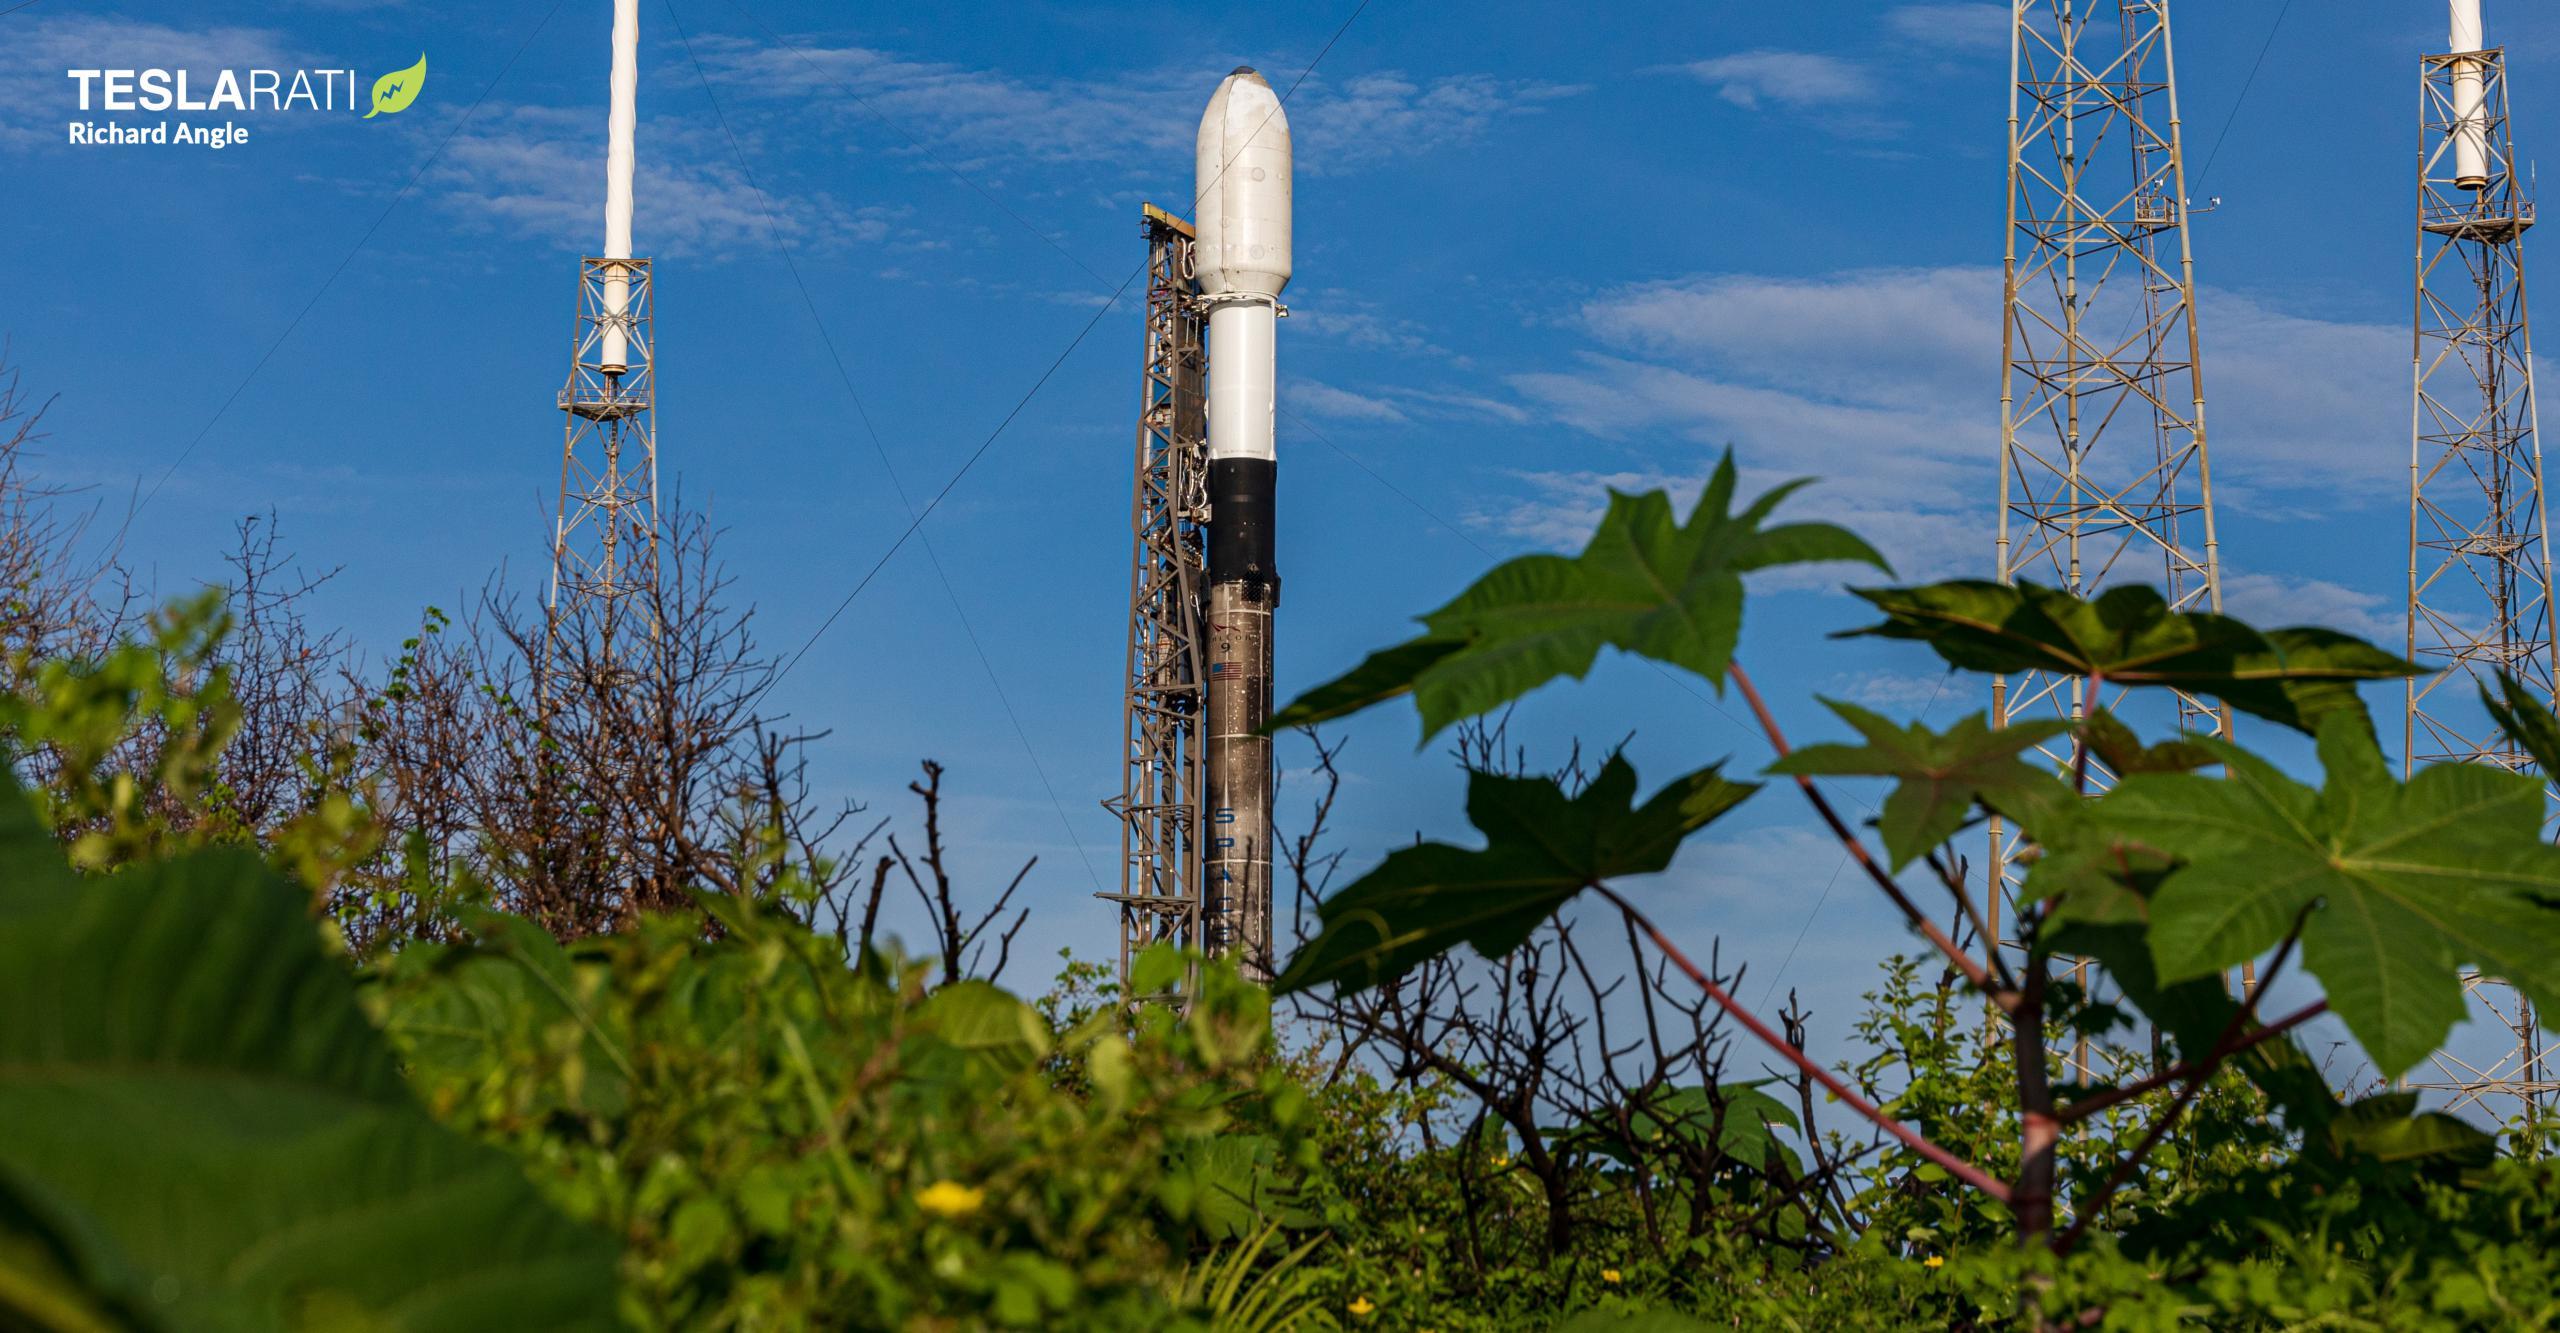 Transporter-2 Falcon 9 B1060 062921 (Richard Angle) prelaunch 1 crop 2 (c)